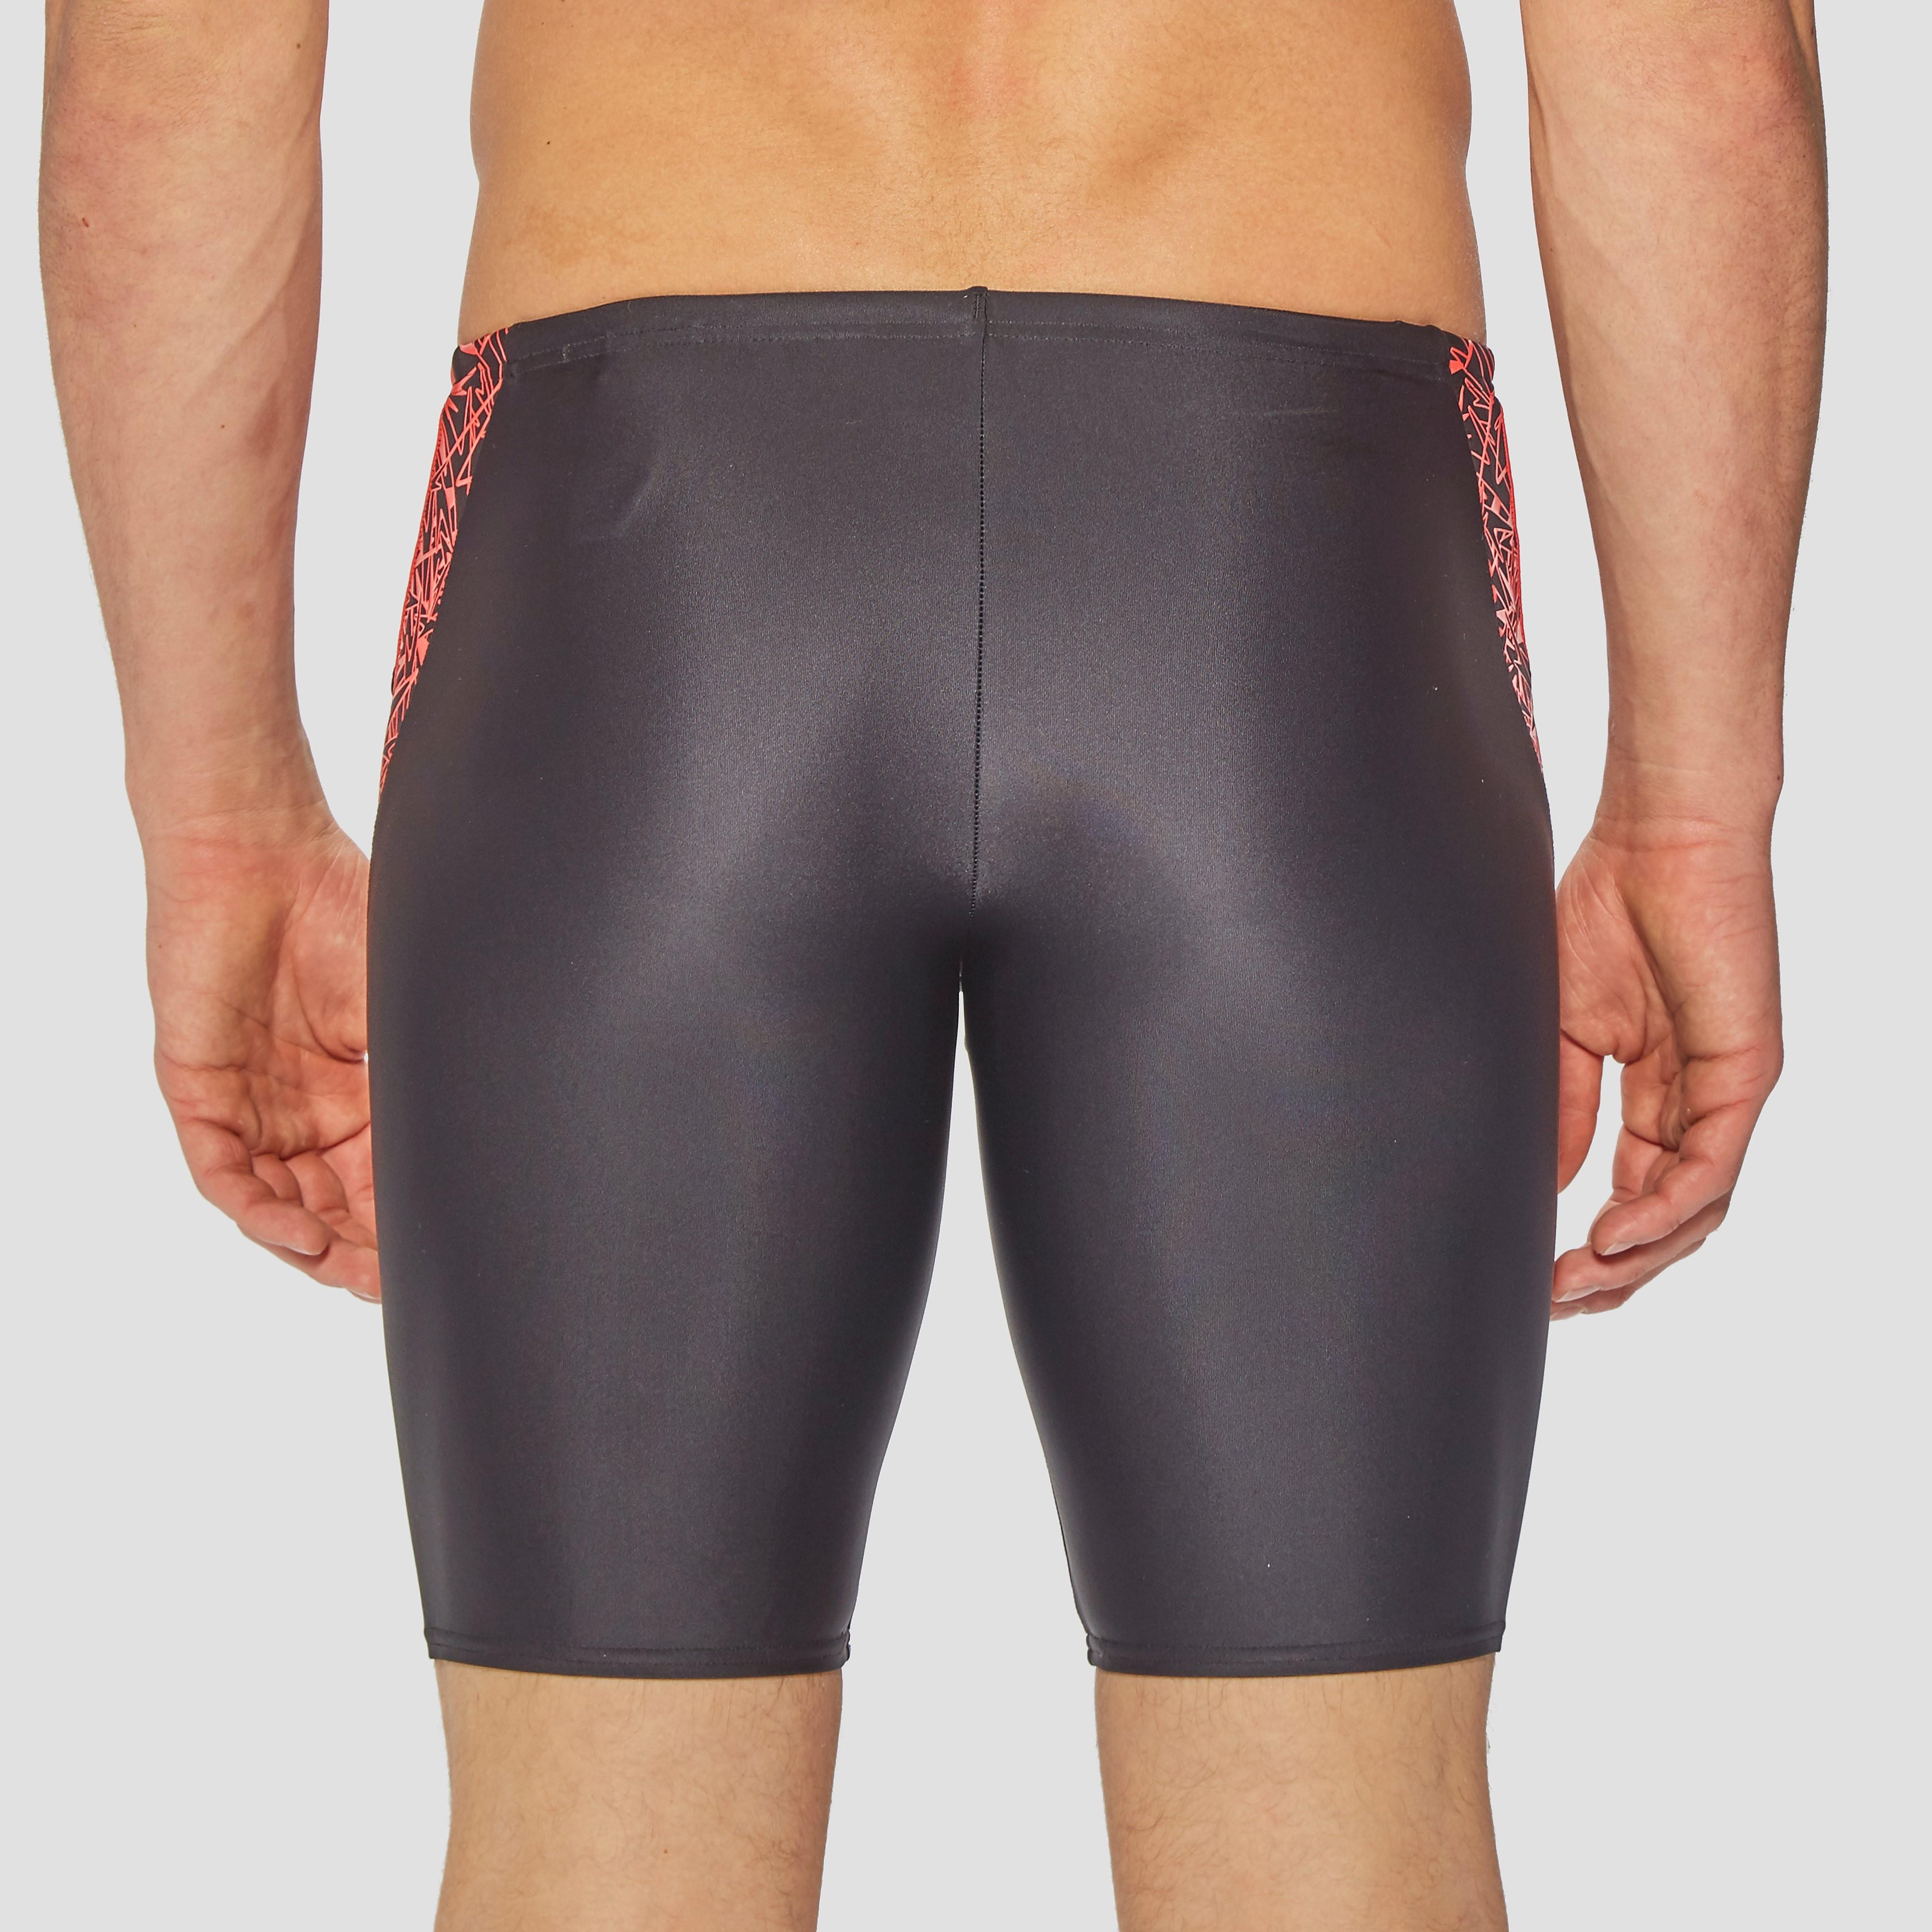 Speedo Boom Splice Junior Swimming Jammer Shorts